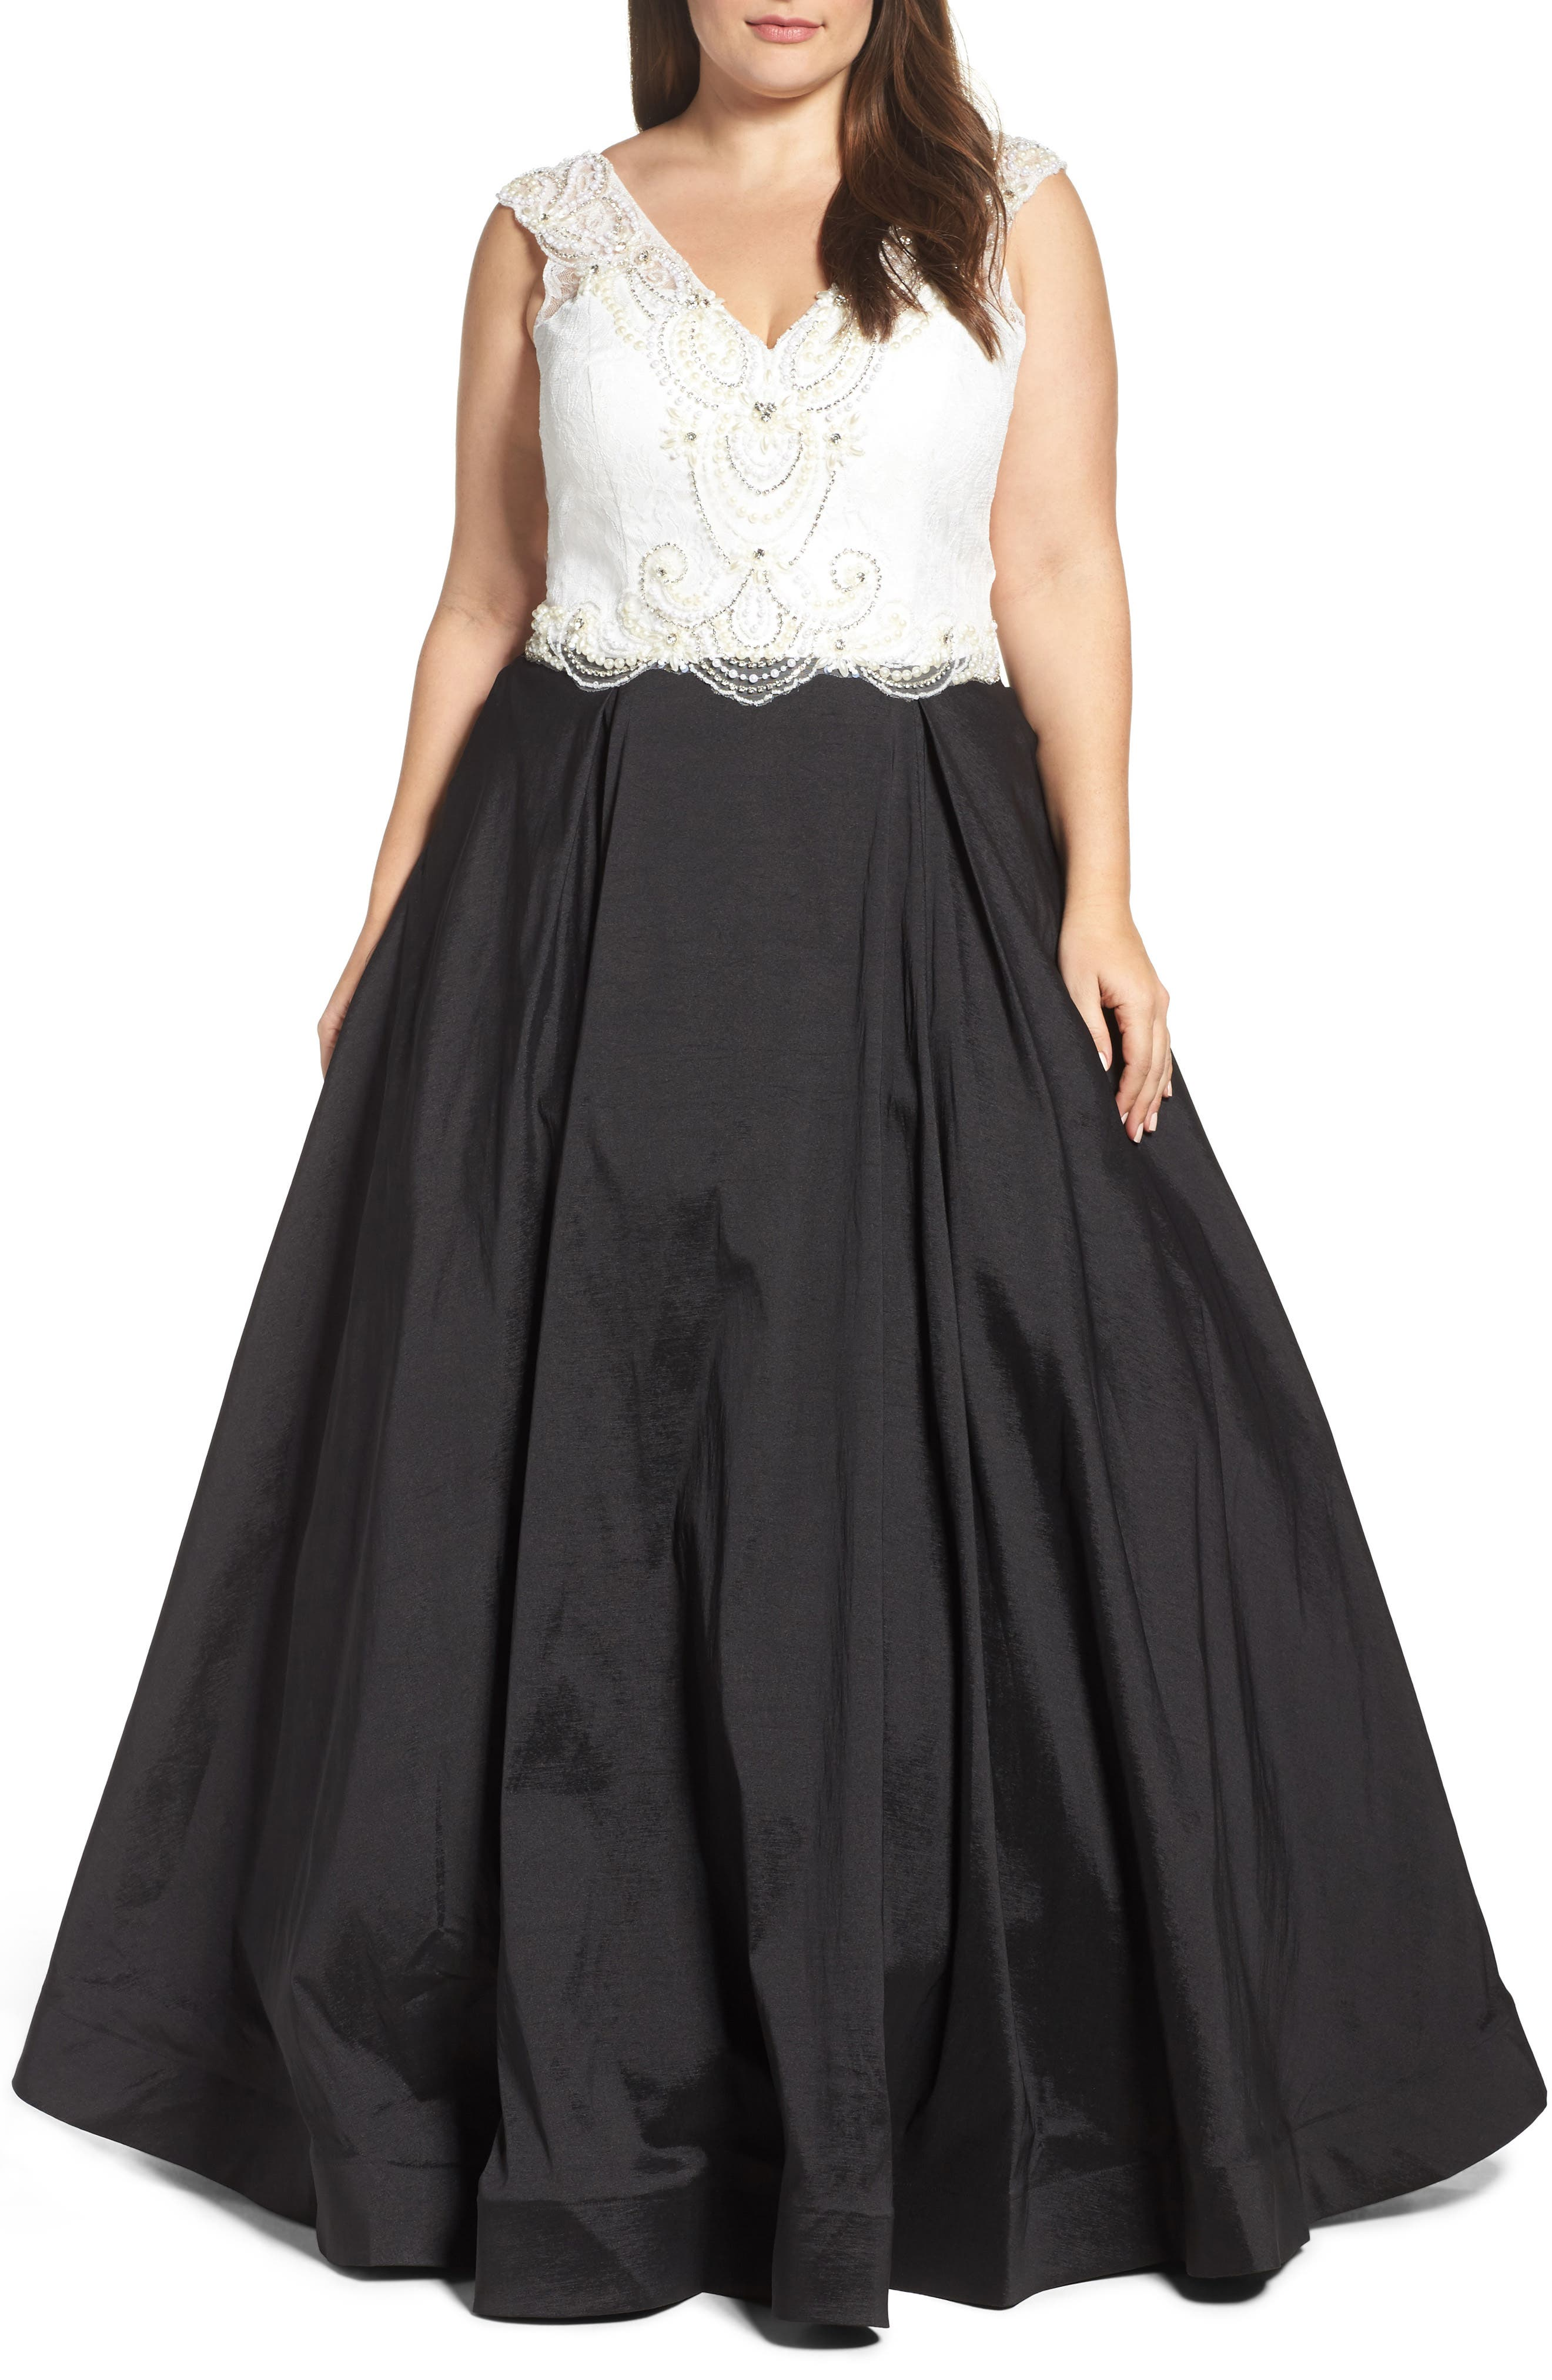 Mac Duggal Embellished Lace & Taffeta Ballgown (Plus Size)